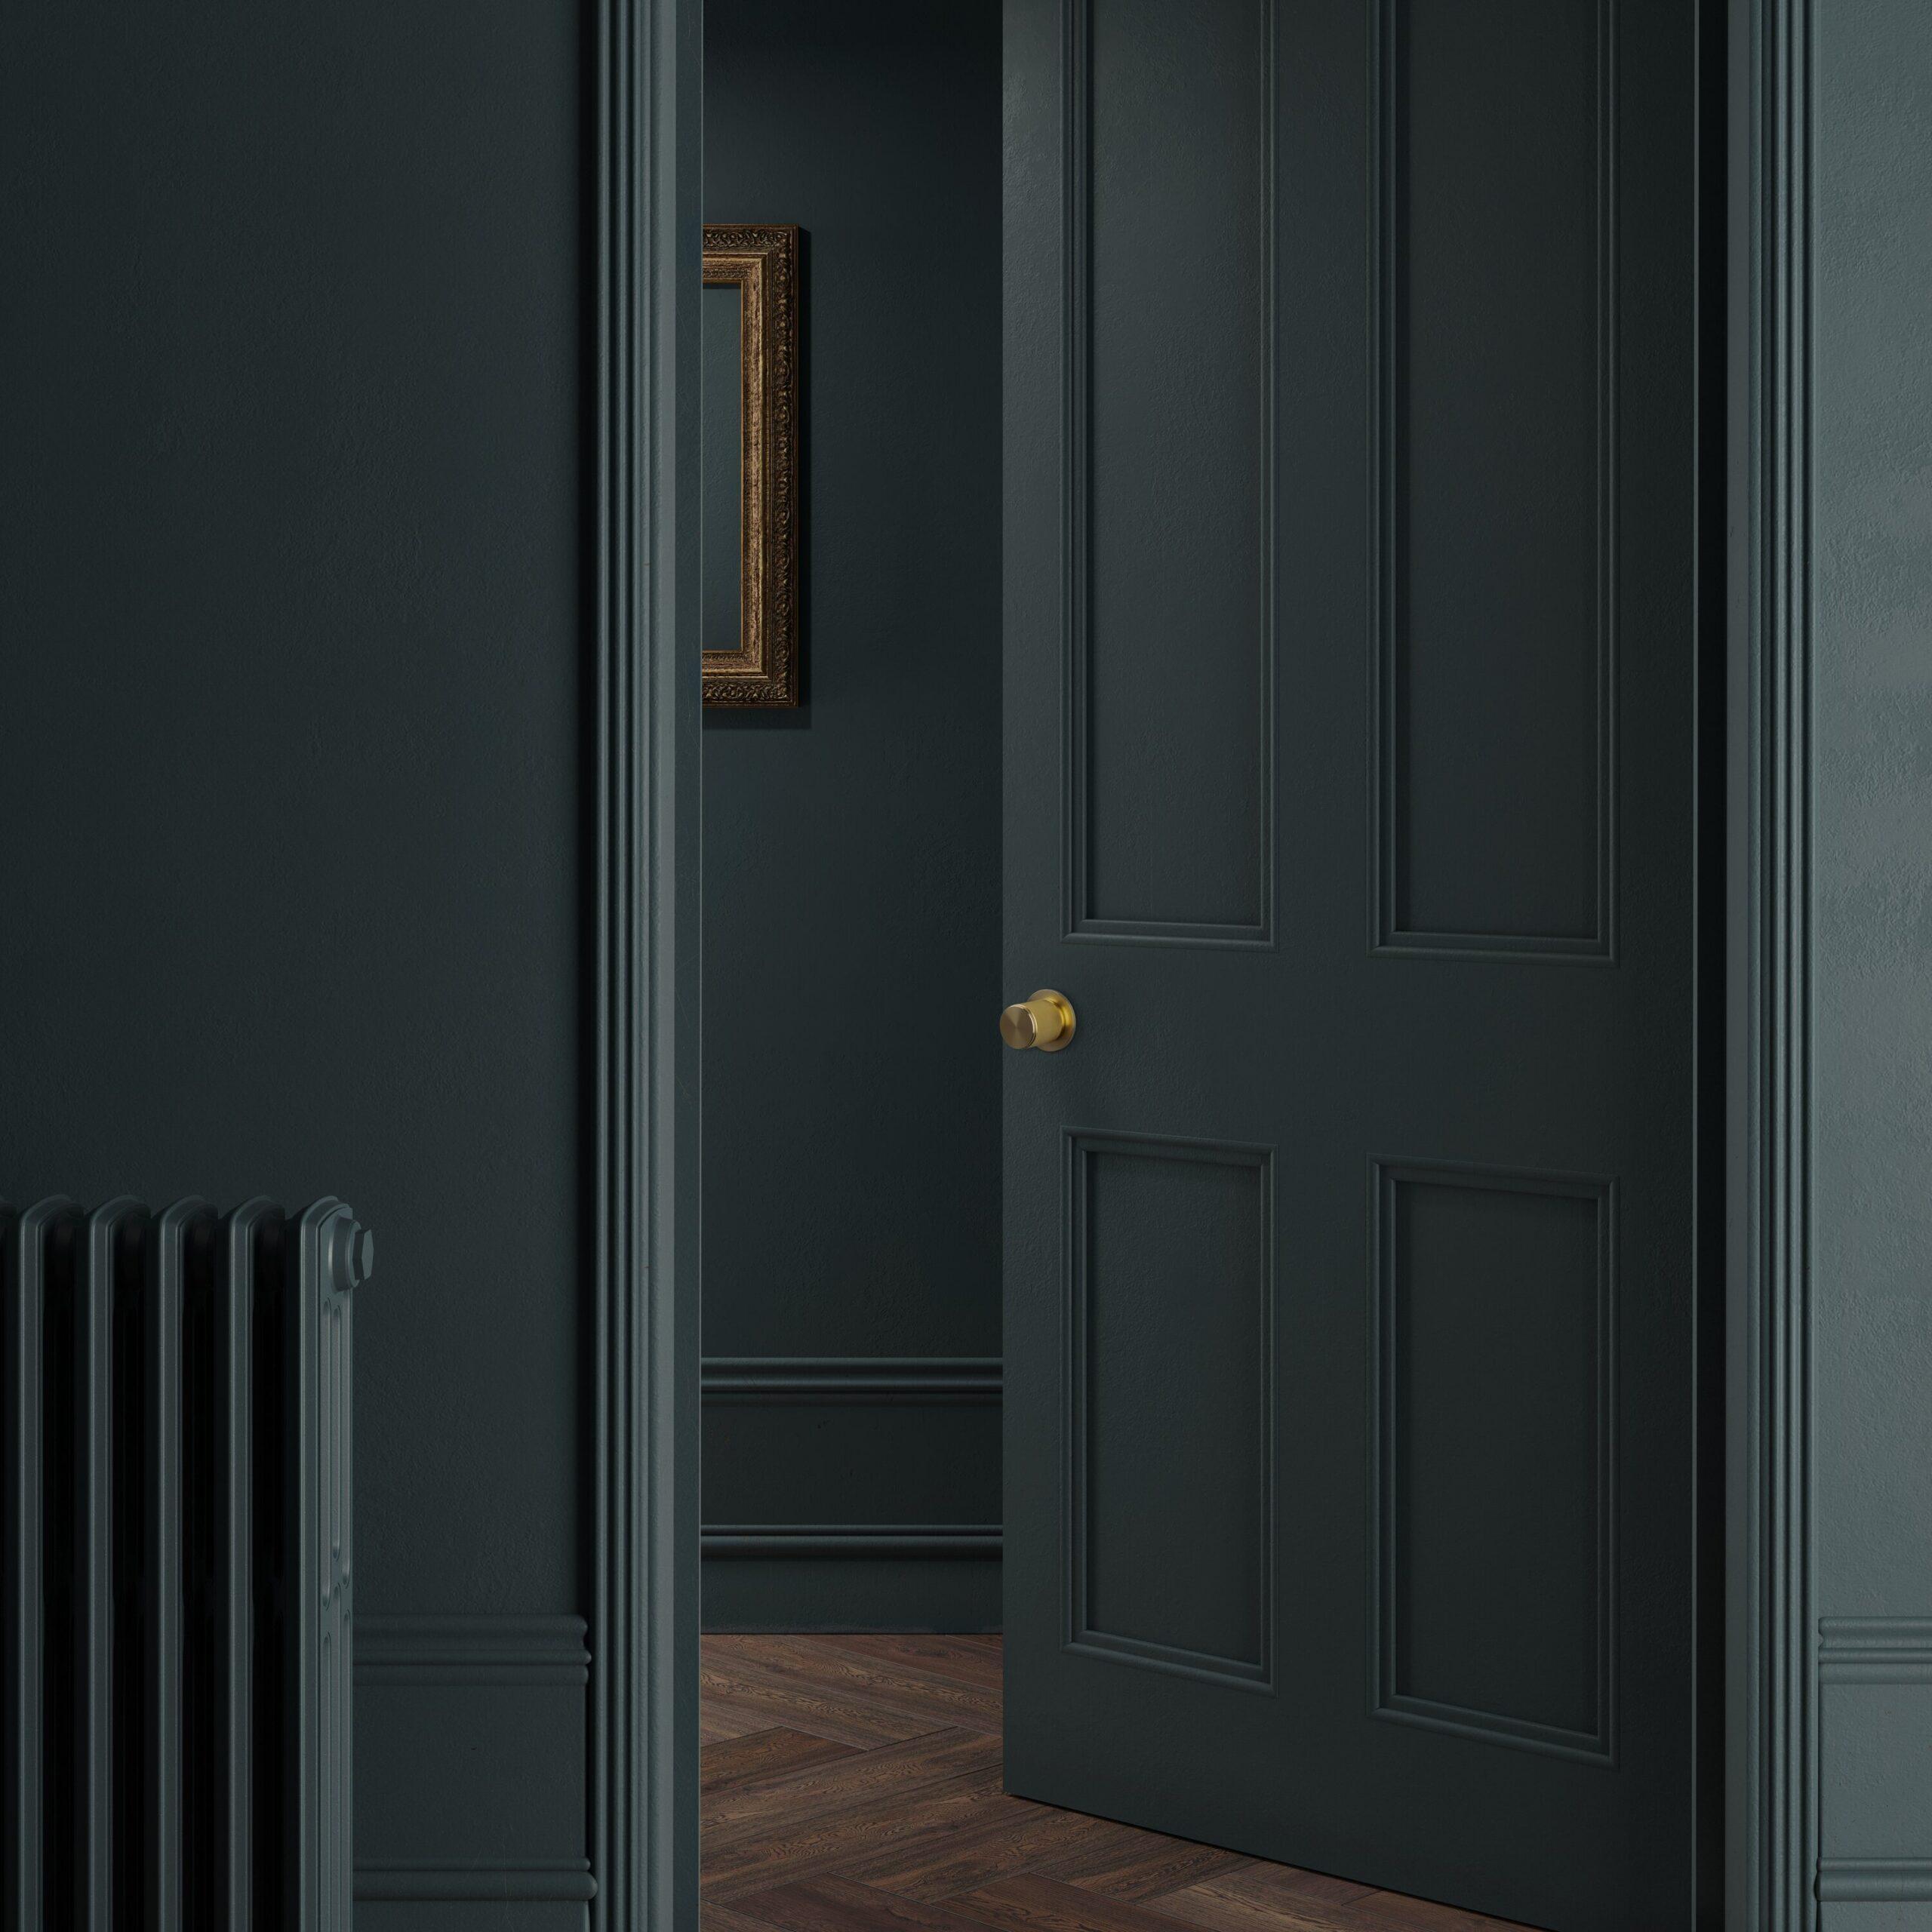 3000x3000_DoorKnob_lifestyle_brass